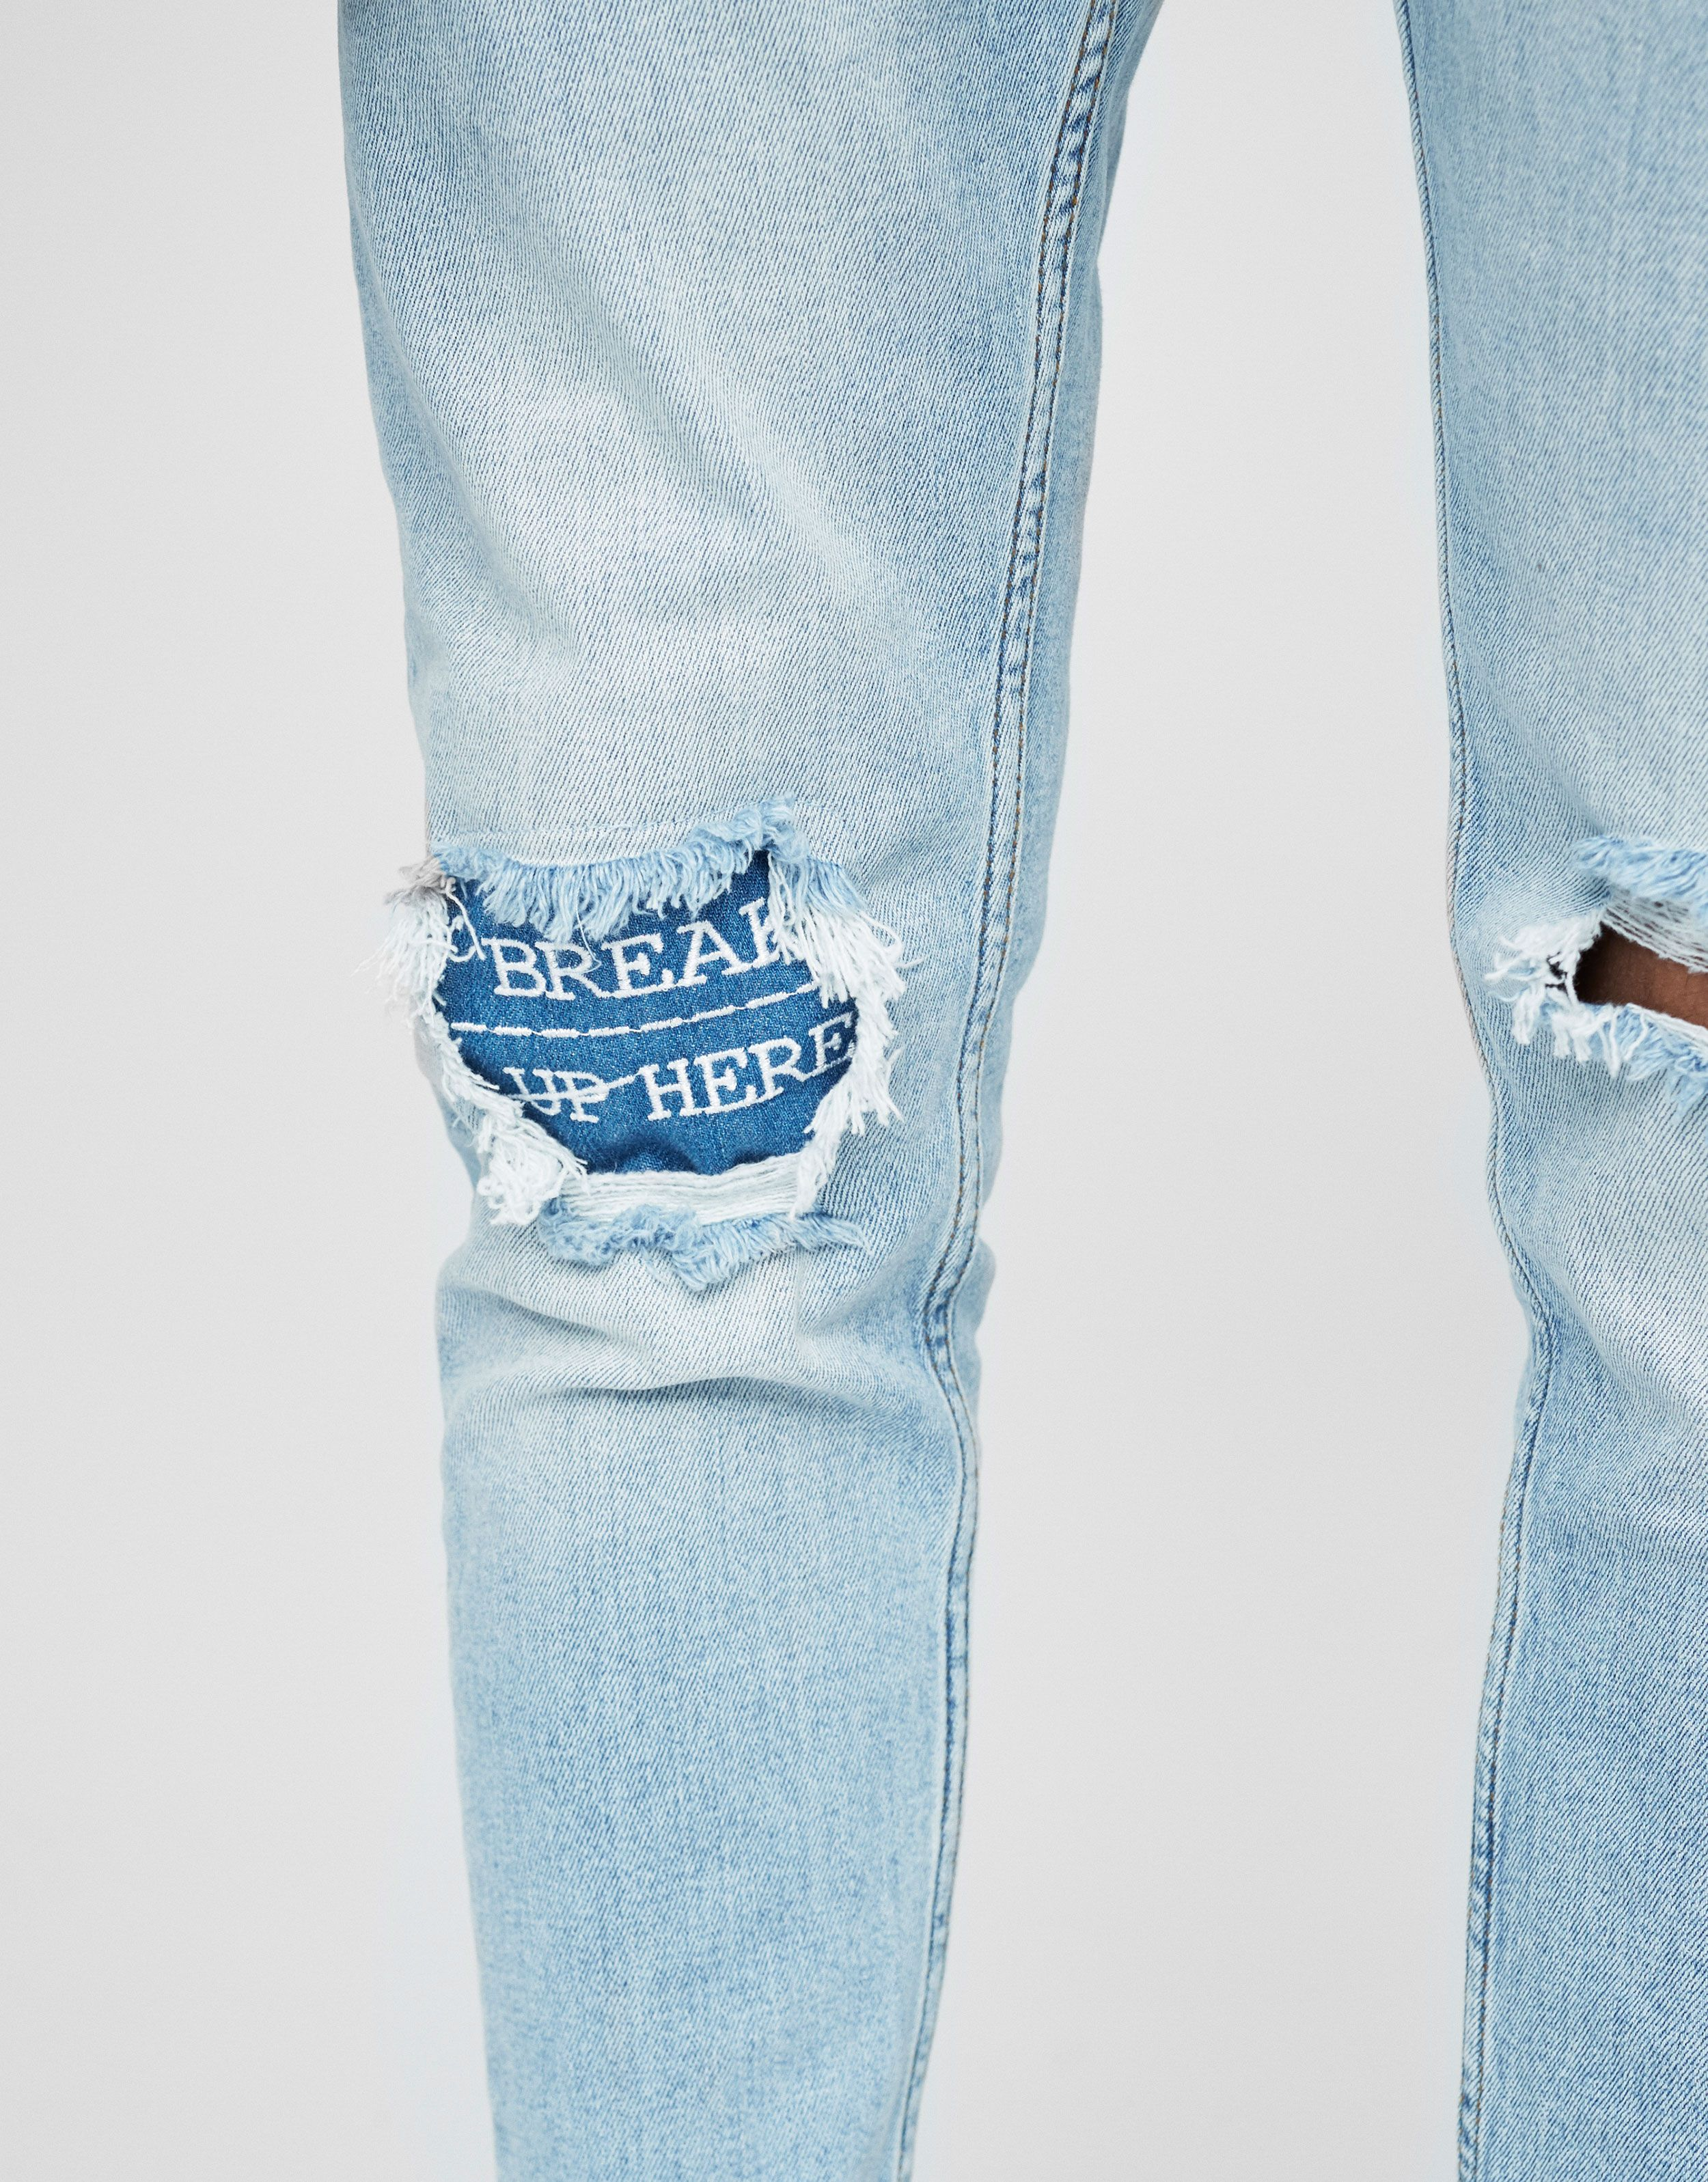 Jeans Carrot Fit Rotos Jeans Ropa Hombre Pull Bear Espana Con Imagenes Tendencias Ropa Ropa De Moda Jeans Hombre